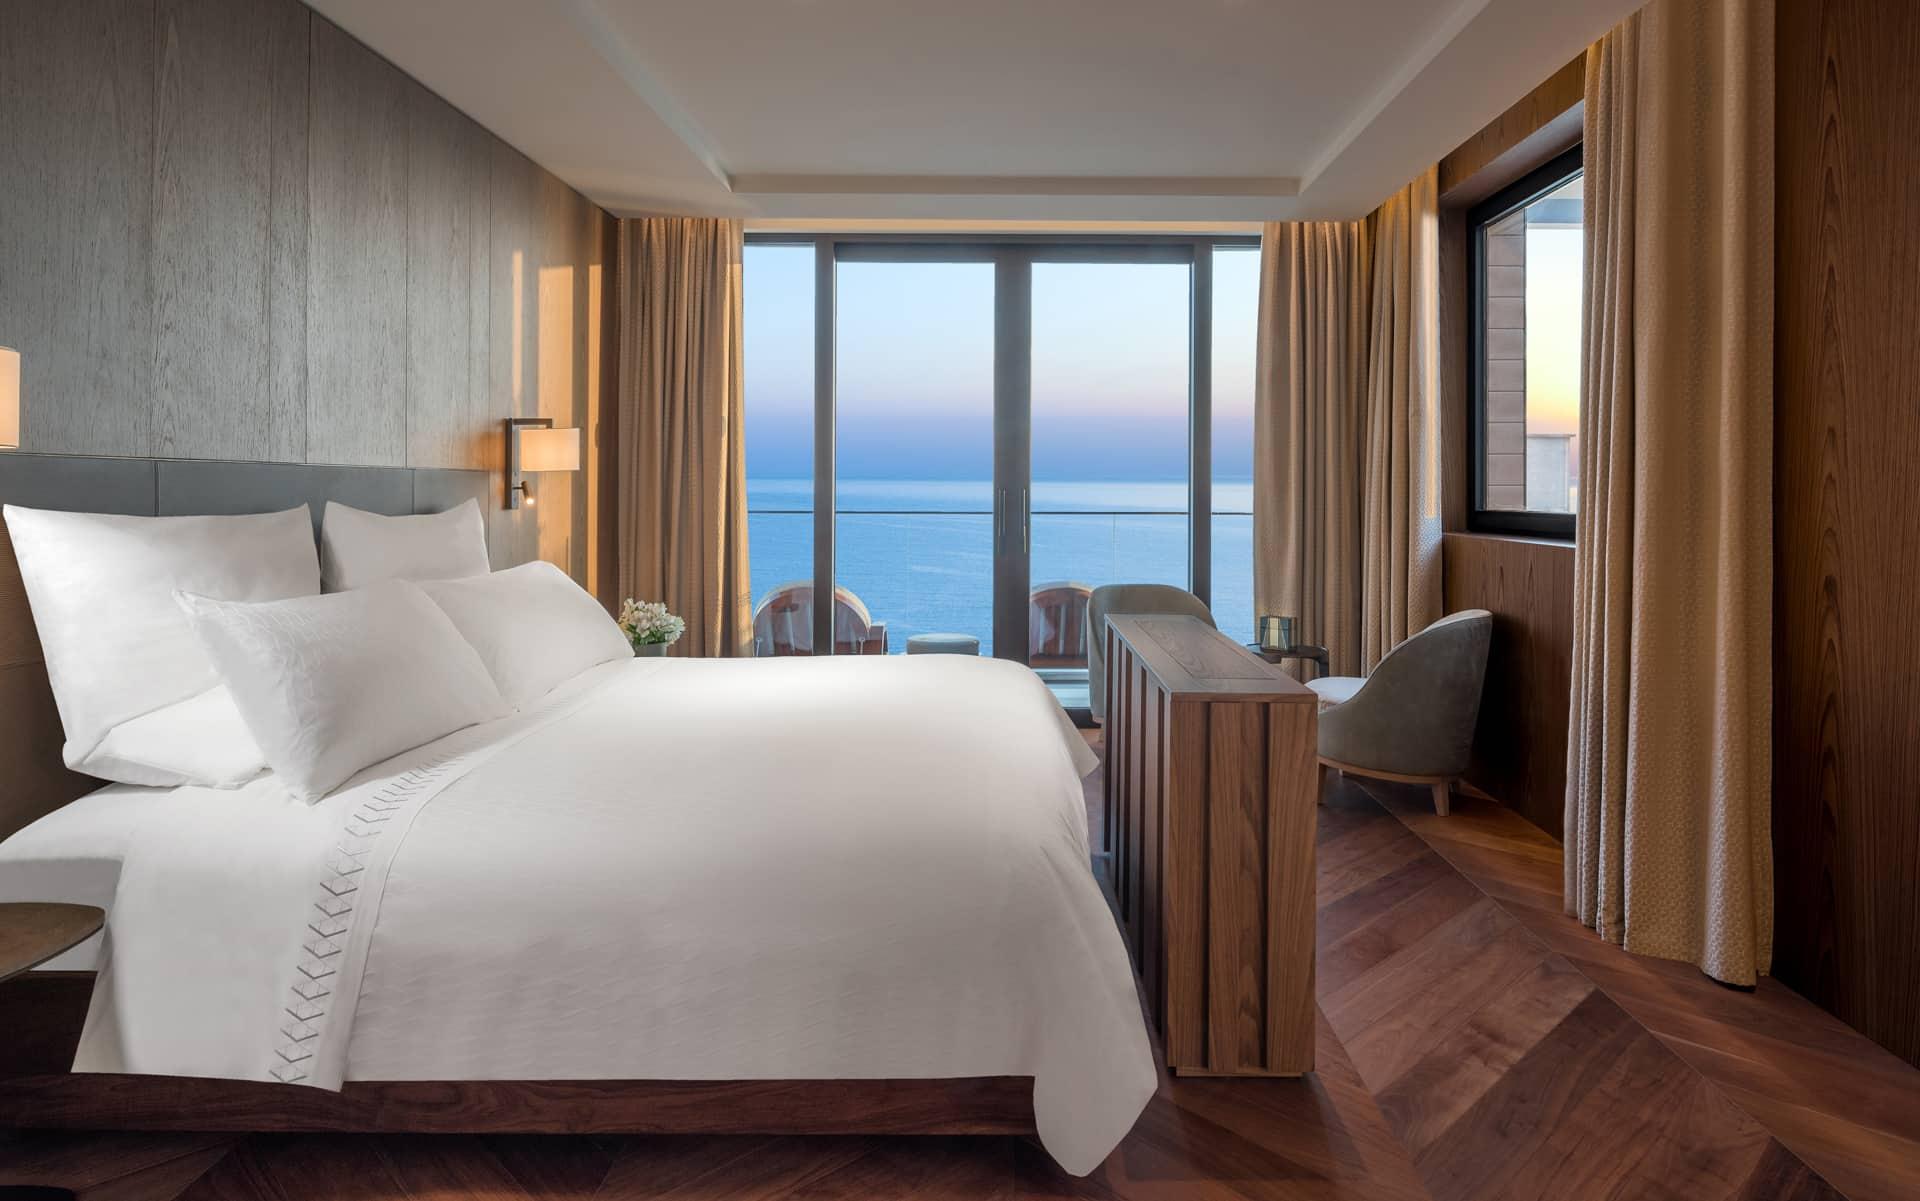 The-Amara-Suite-Bedroom-n°2-1920×1201-s